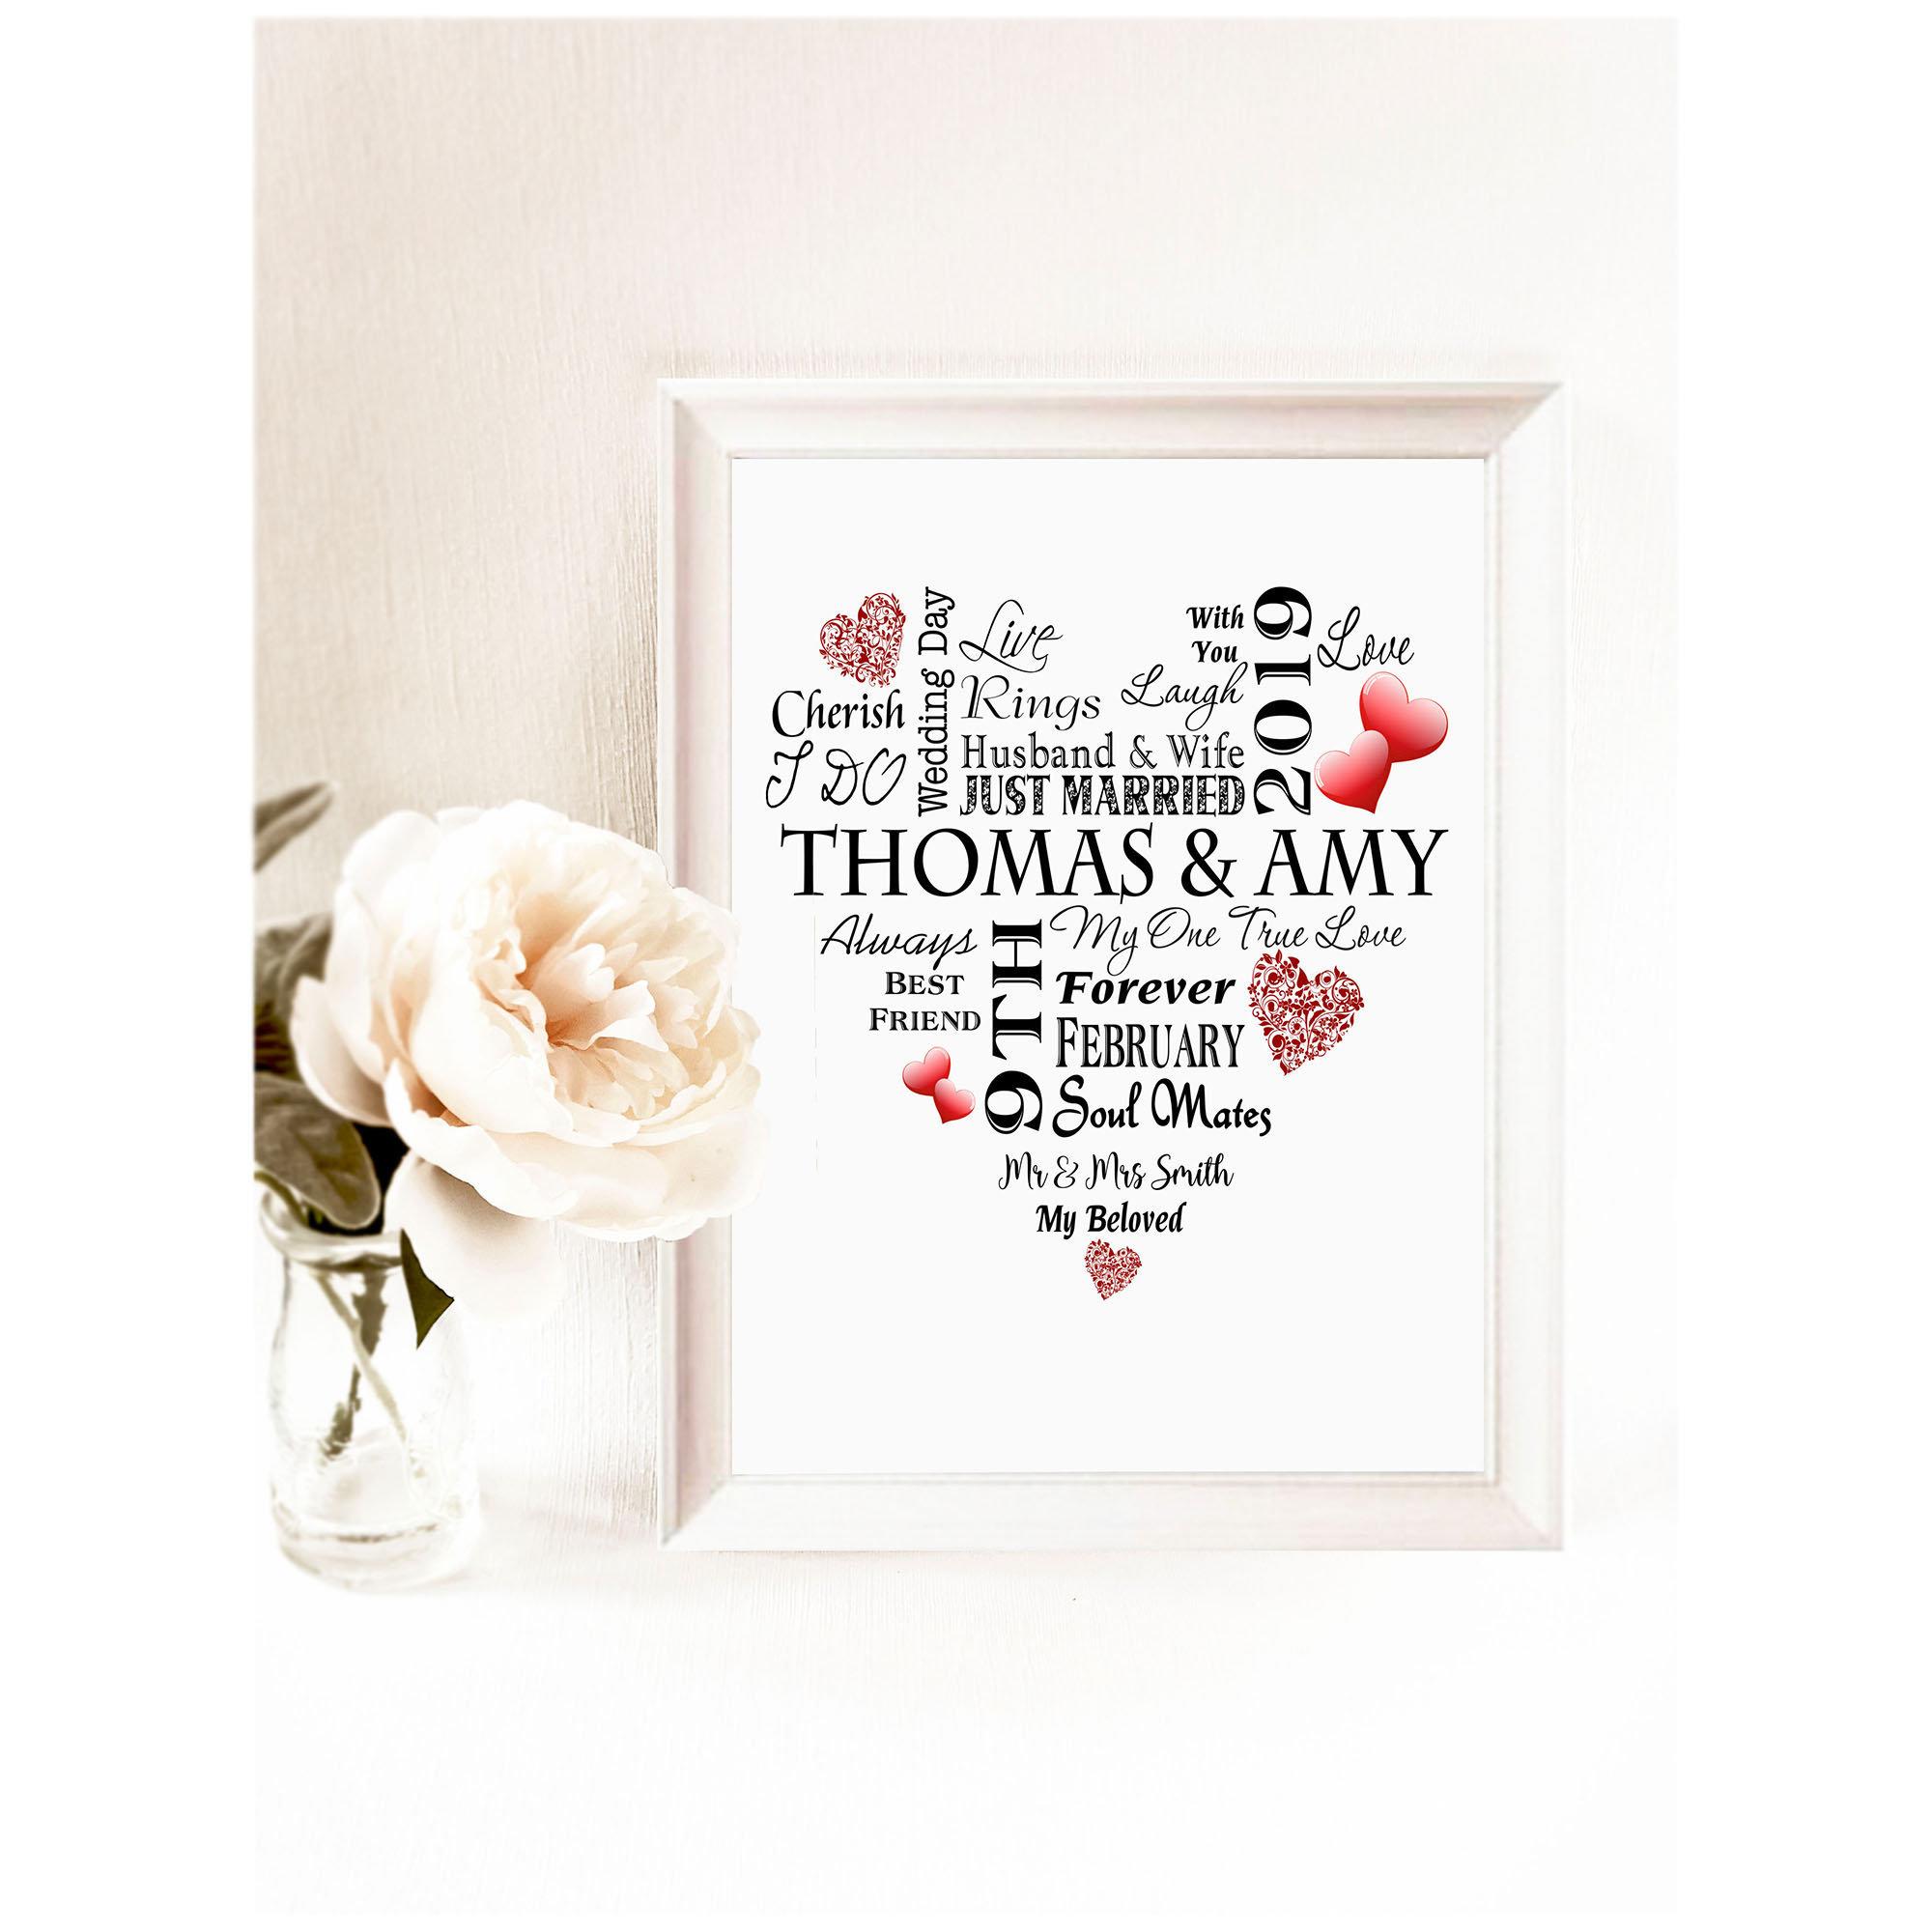 Handmade Wall Plaque Personalised Wedding Gift Word art Bride /& Groom Mr /& Mrs